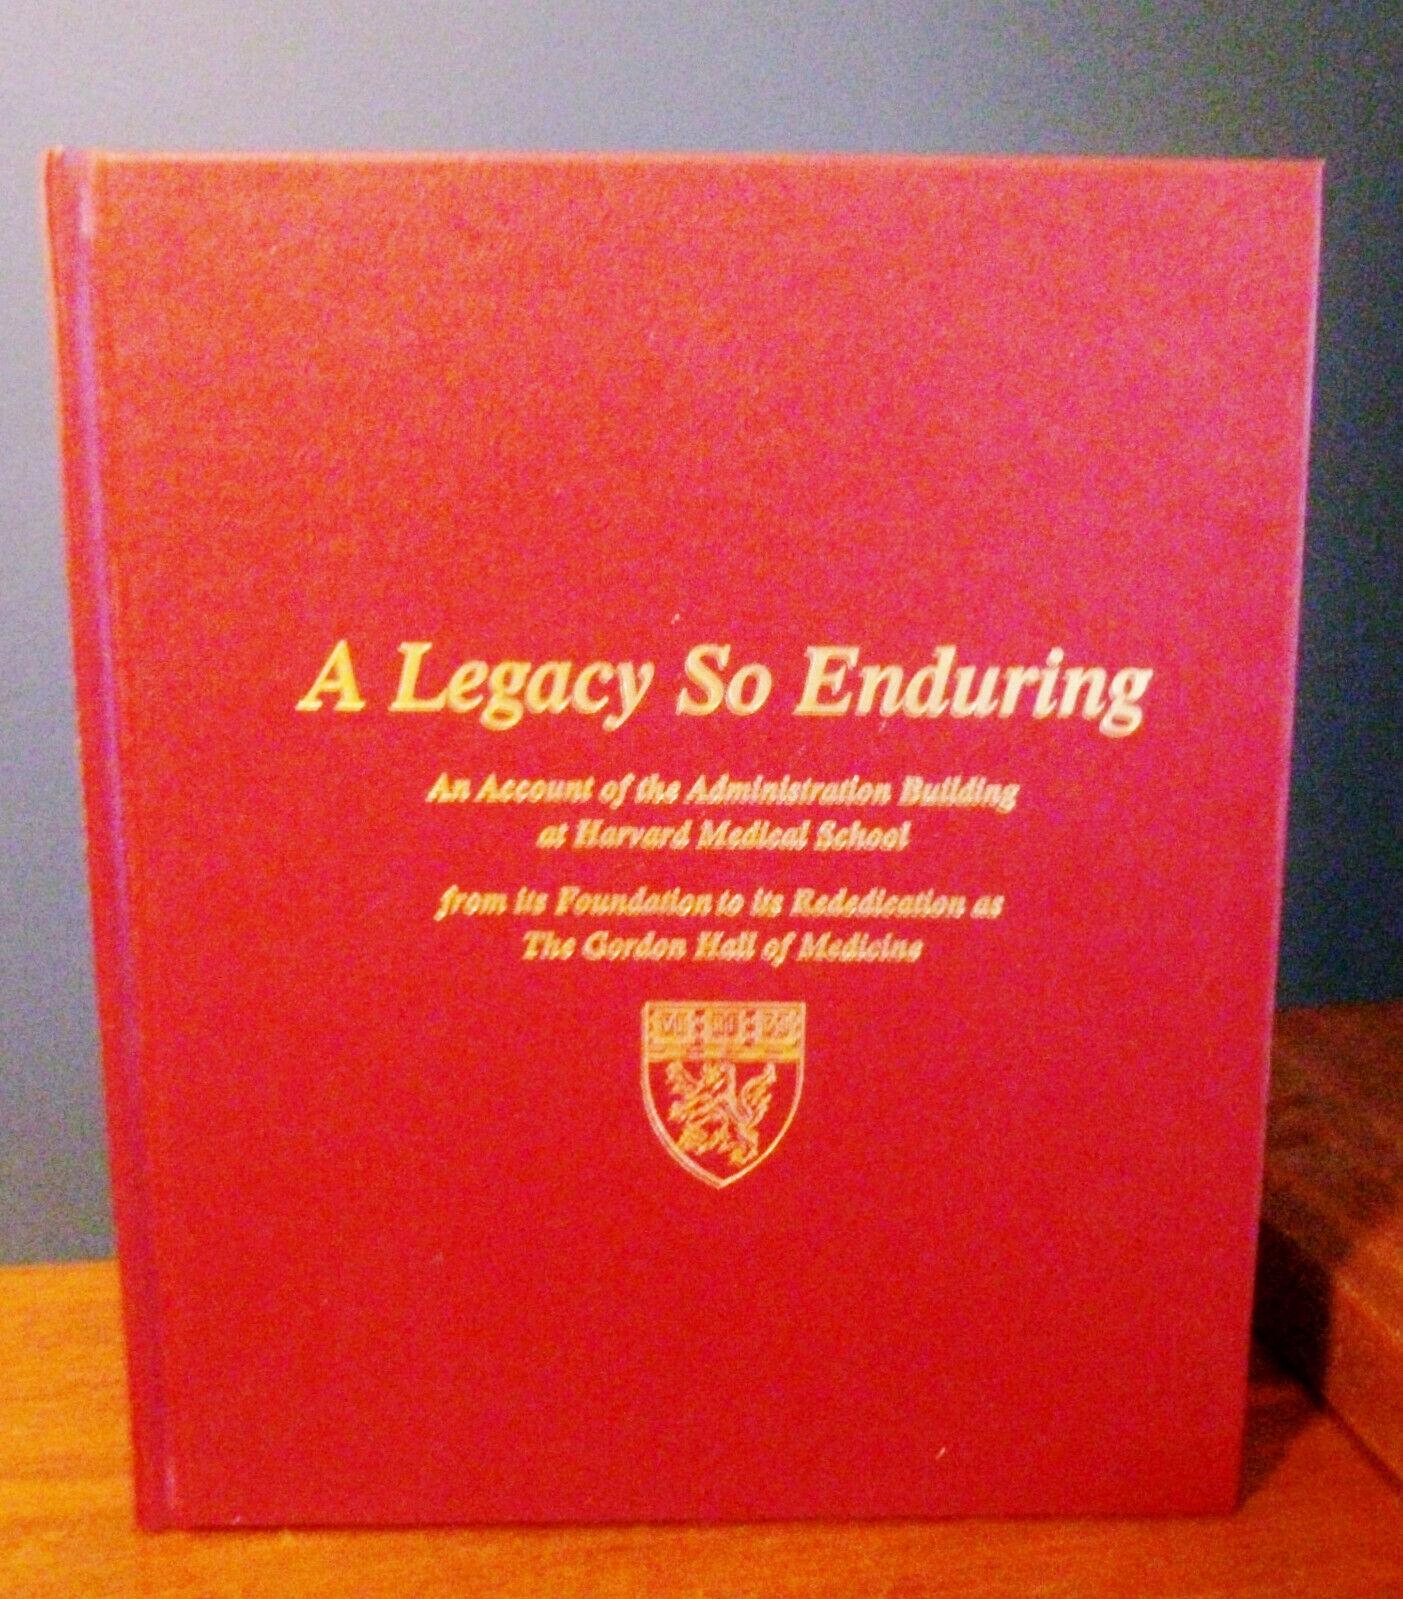 Harvard Medical School History Gordon Hall Medicine Enduring Legacy Book 2001 2